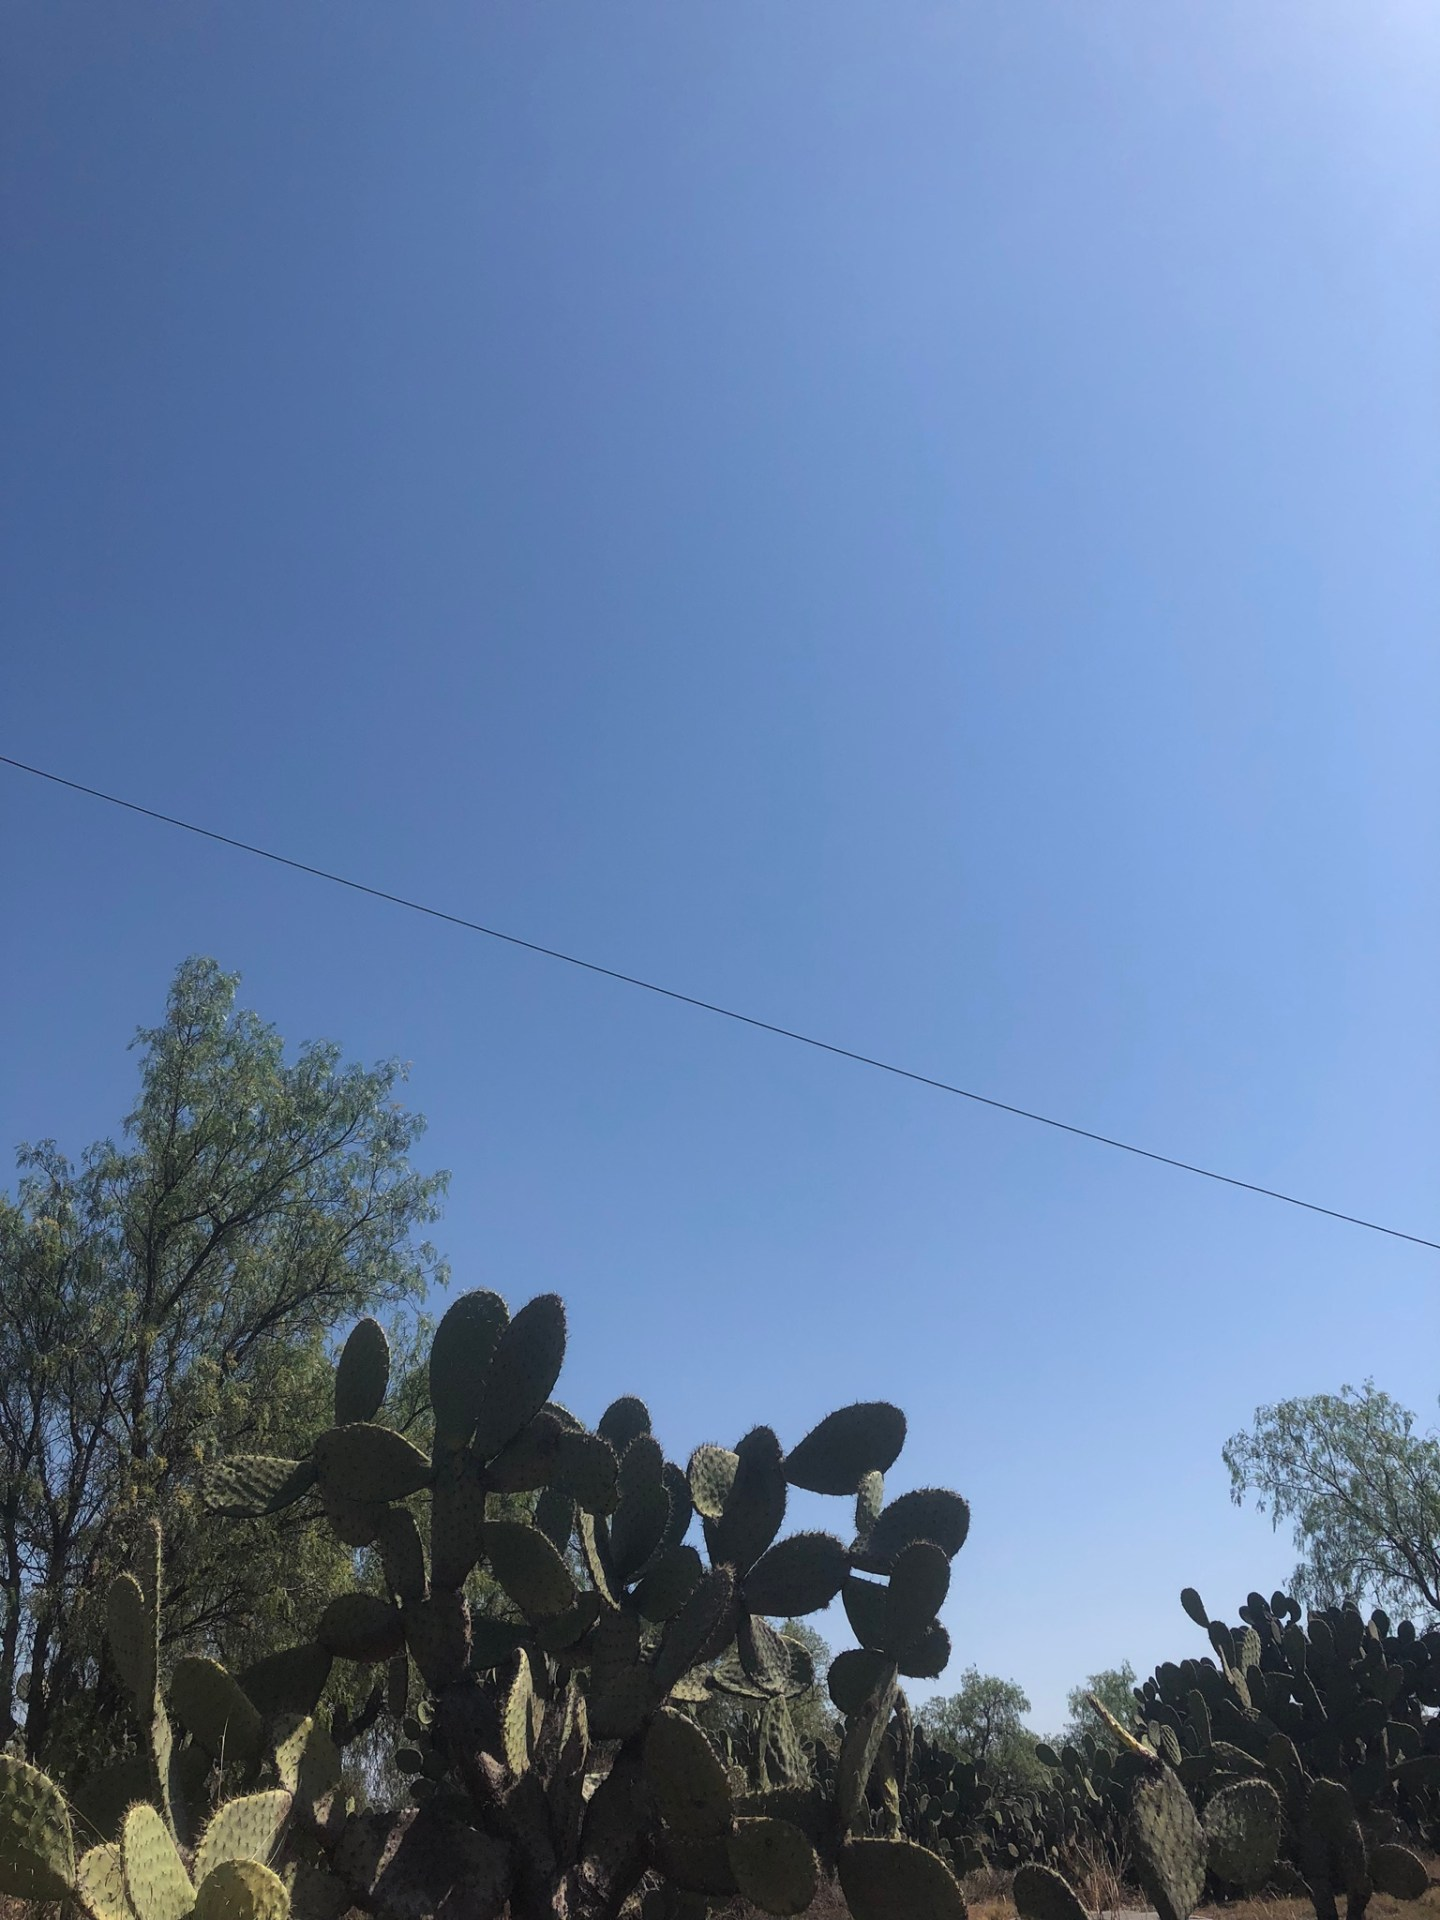 Cacti in Mexico